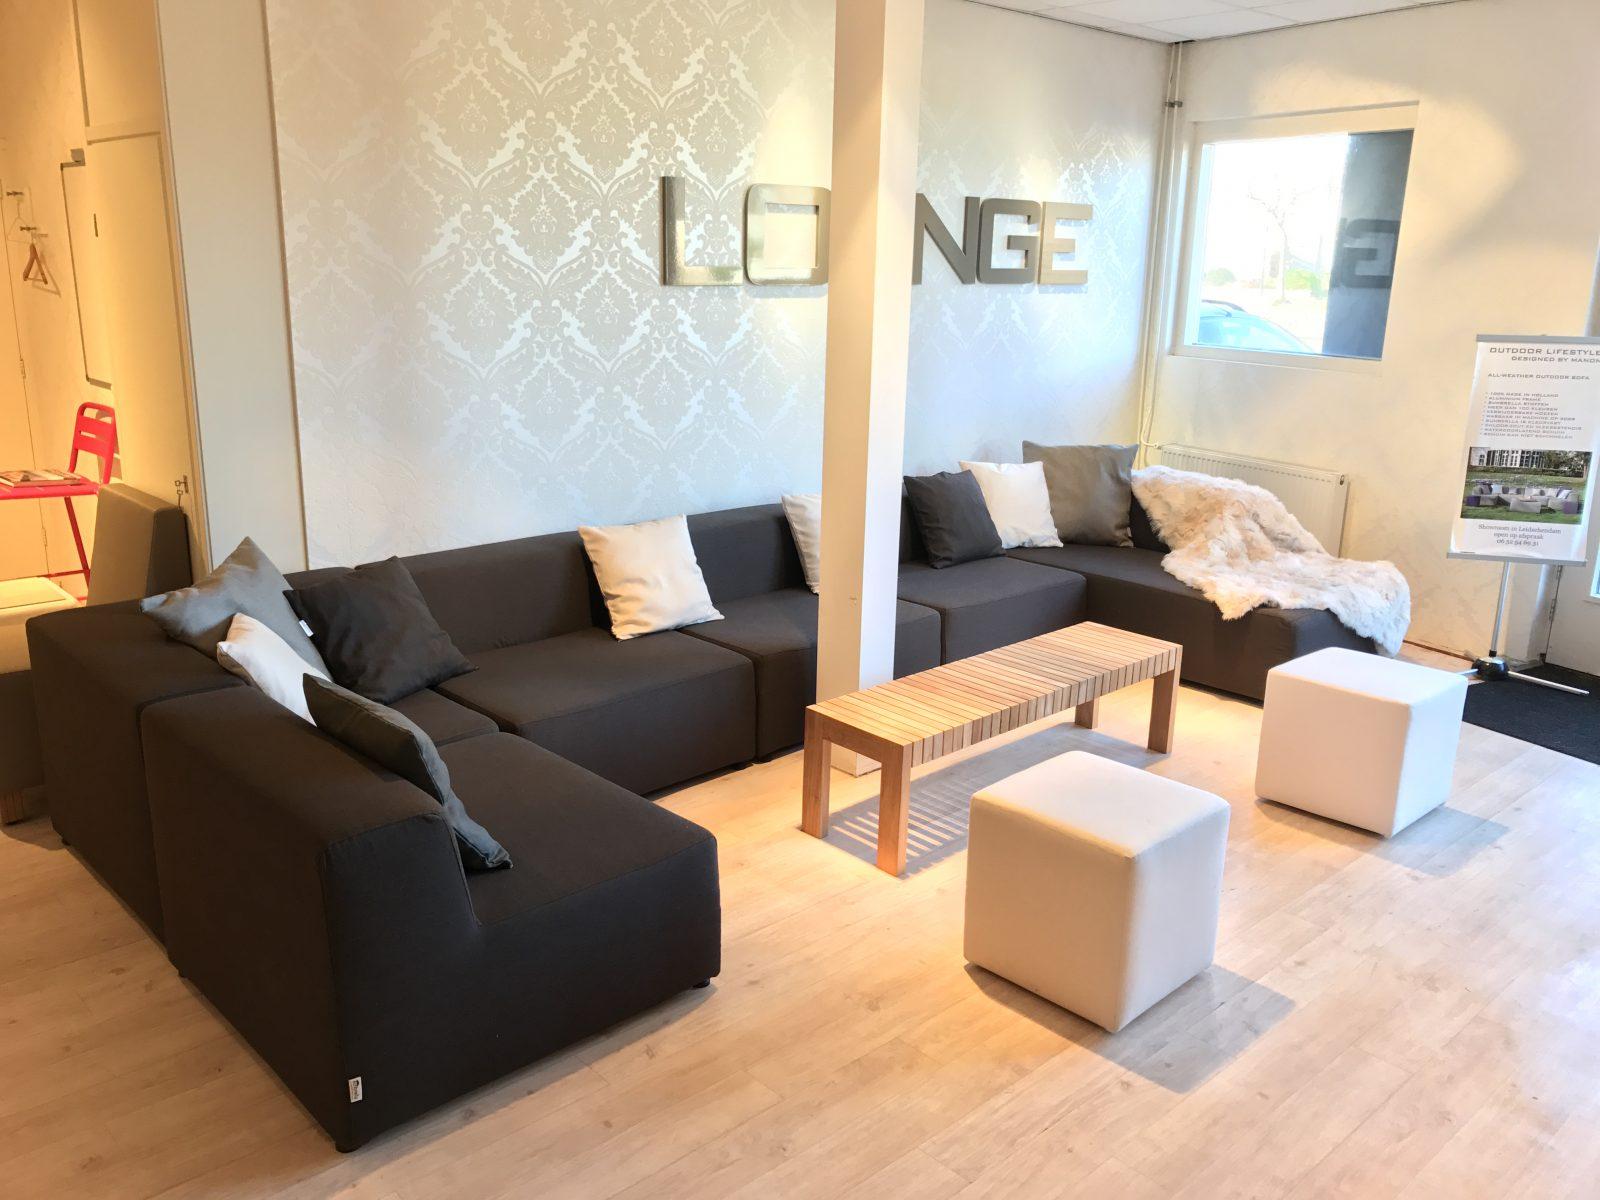 Design Bank Aanbieding.Aanbieding Donker Bruine Bank Outdoor Lifestyle